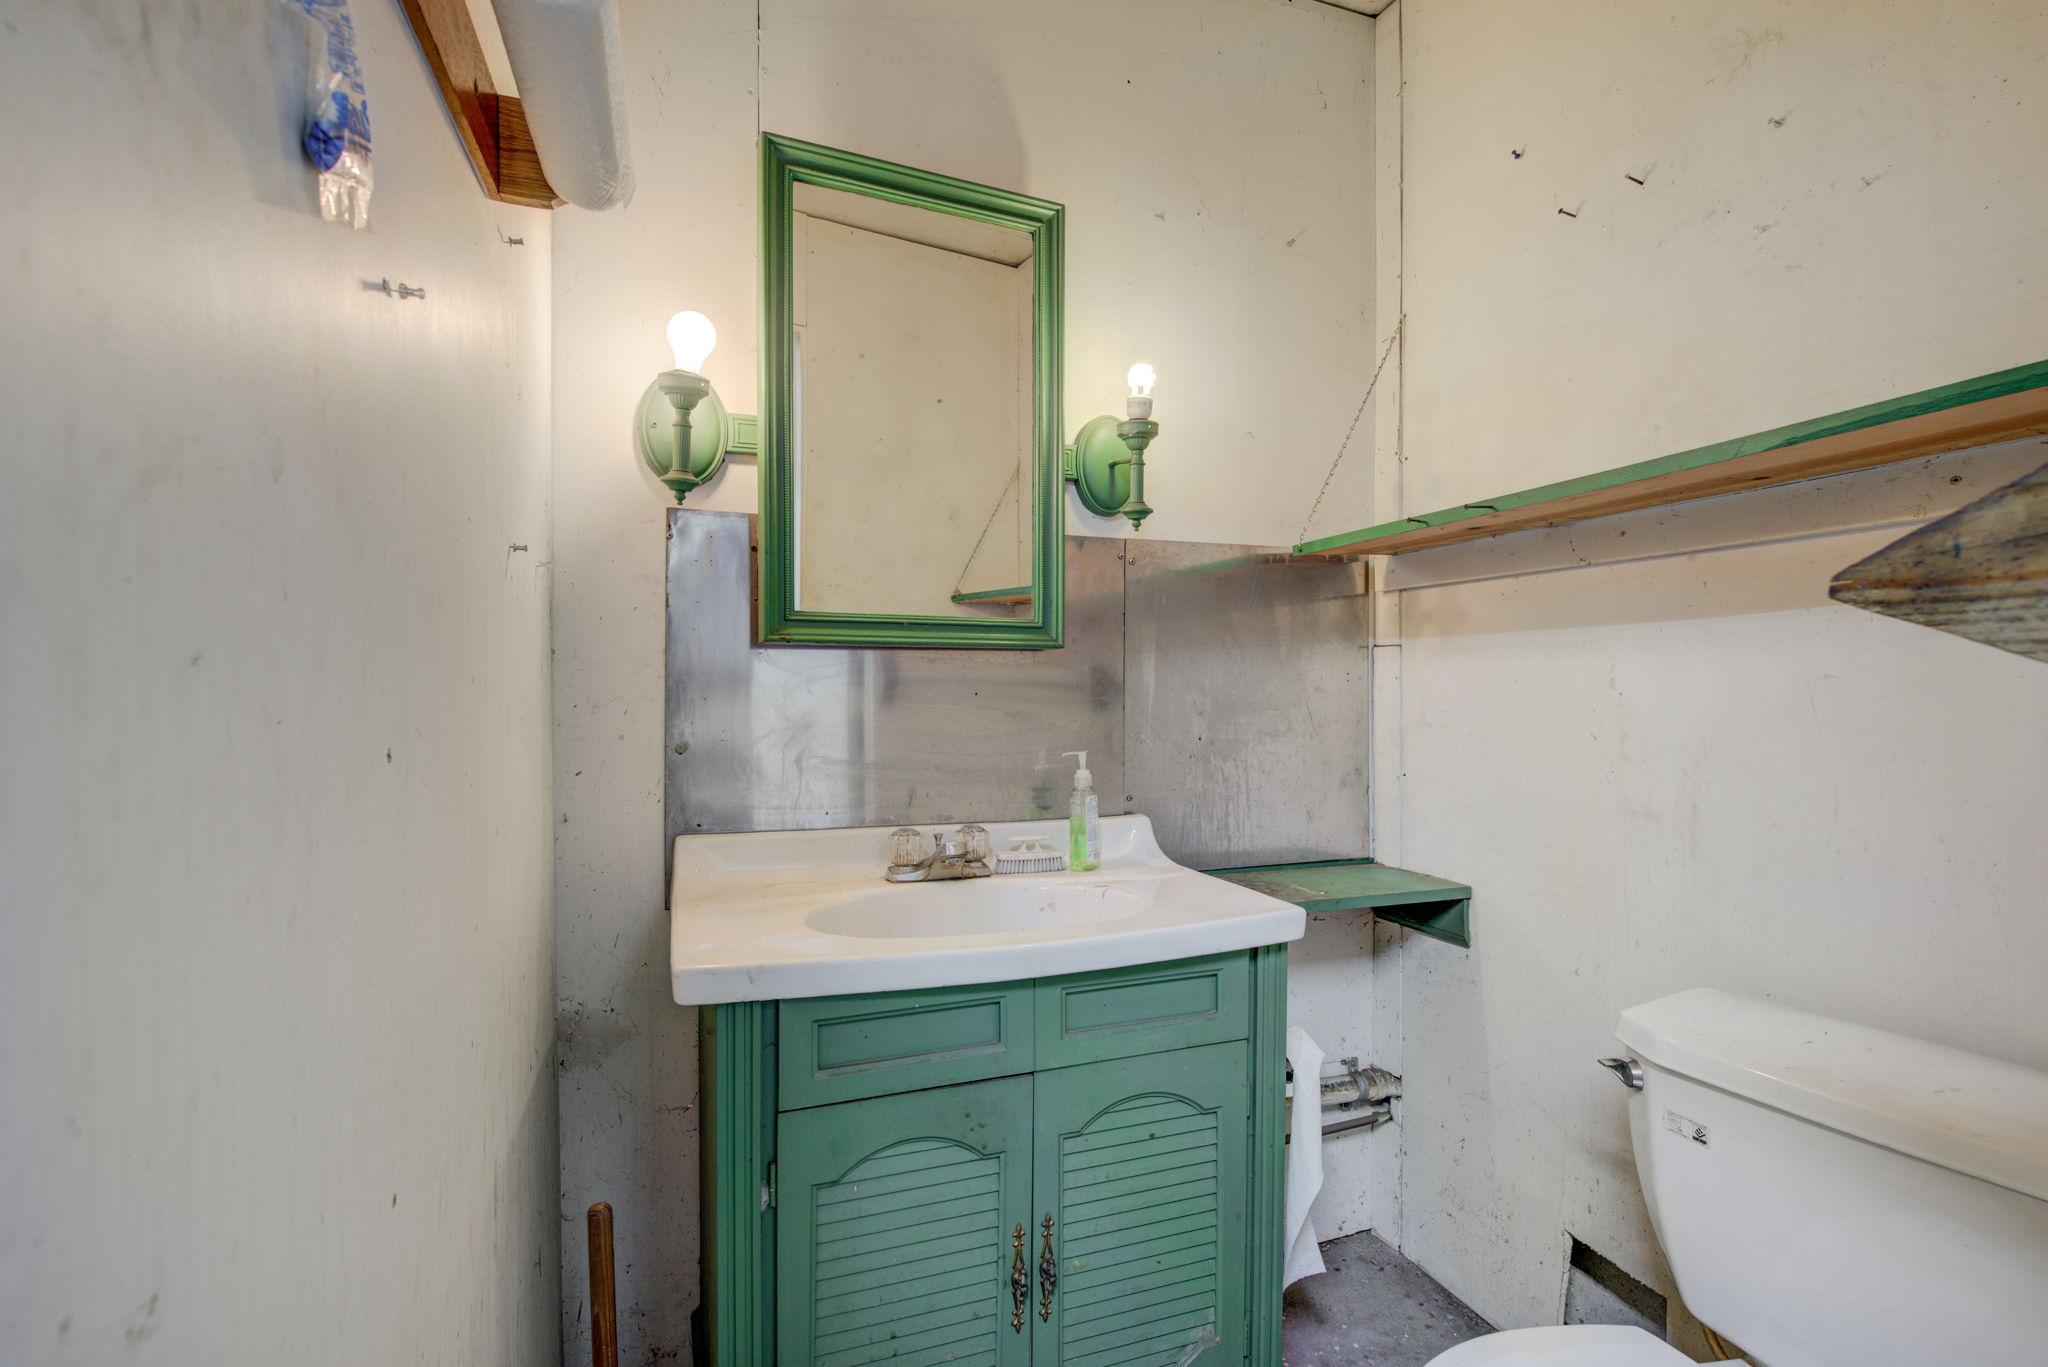 Detached Garage Bathroom